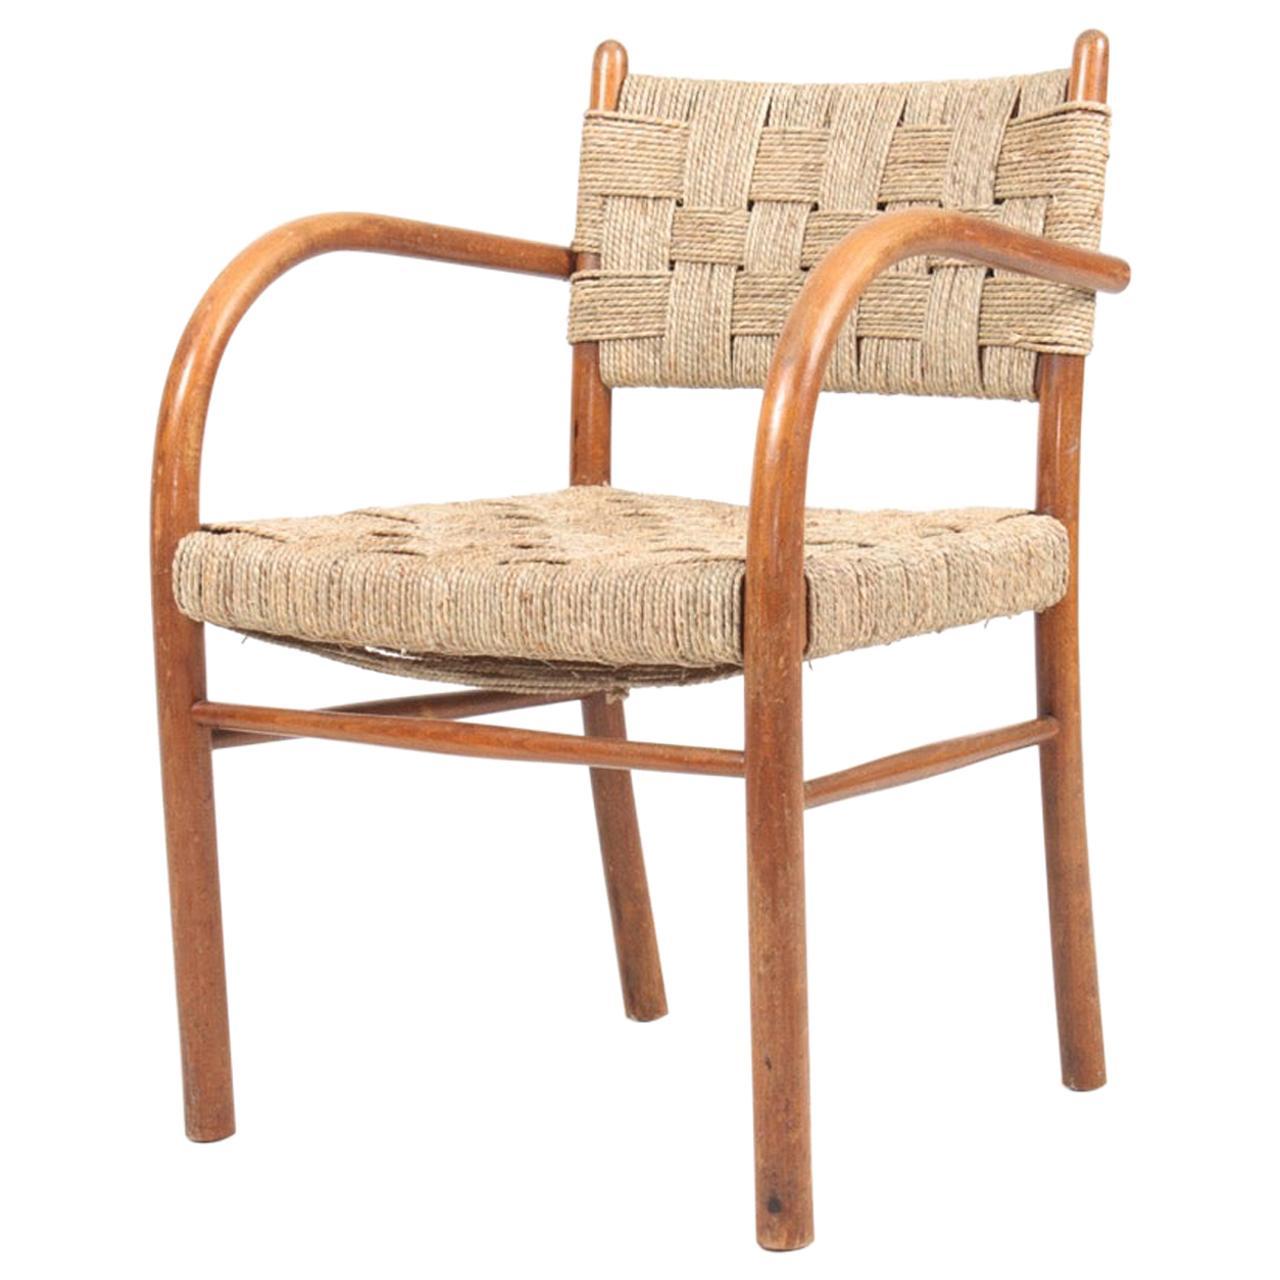 Danish Armchair by Frits Schlegel, Made in Denmark, 1940s